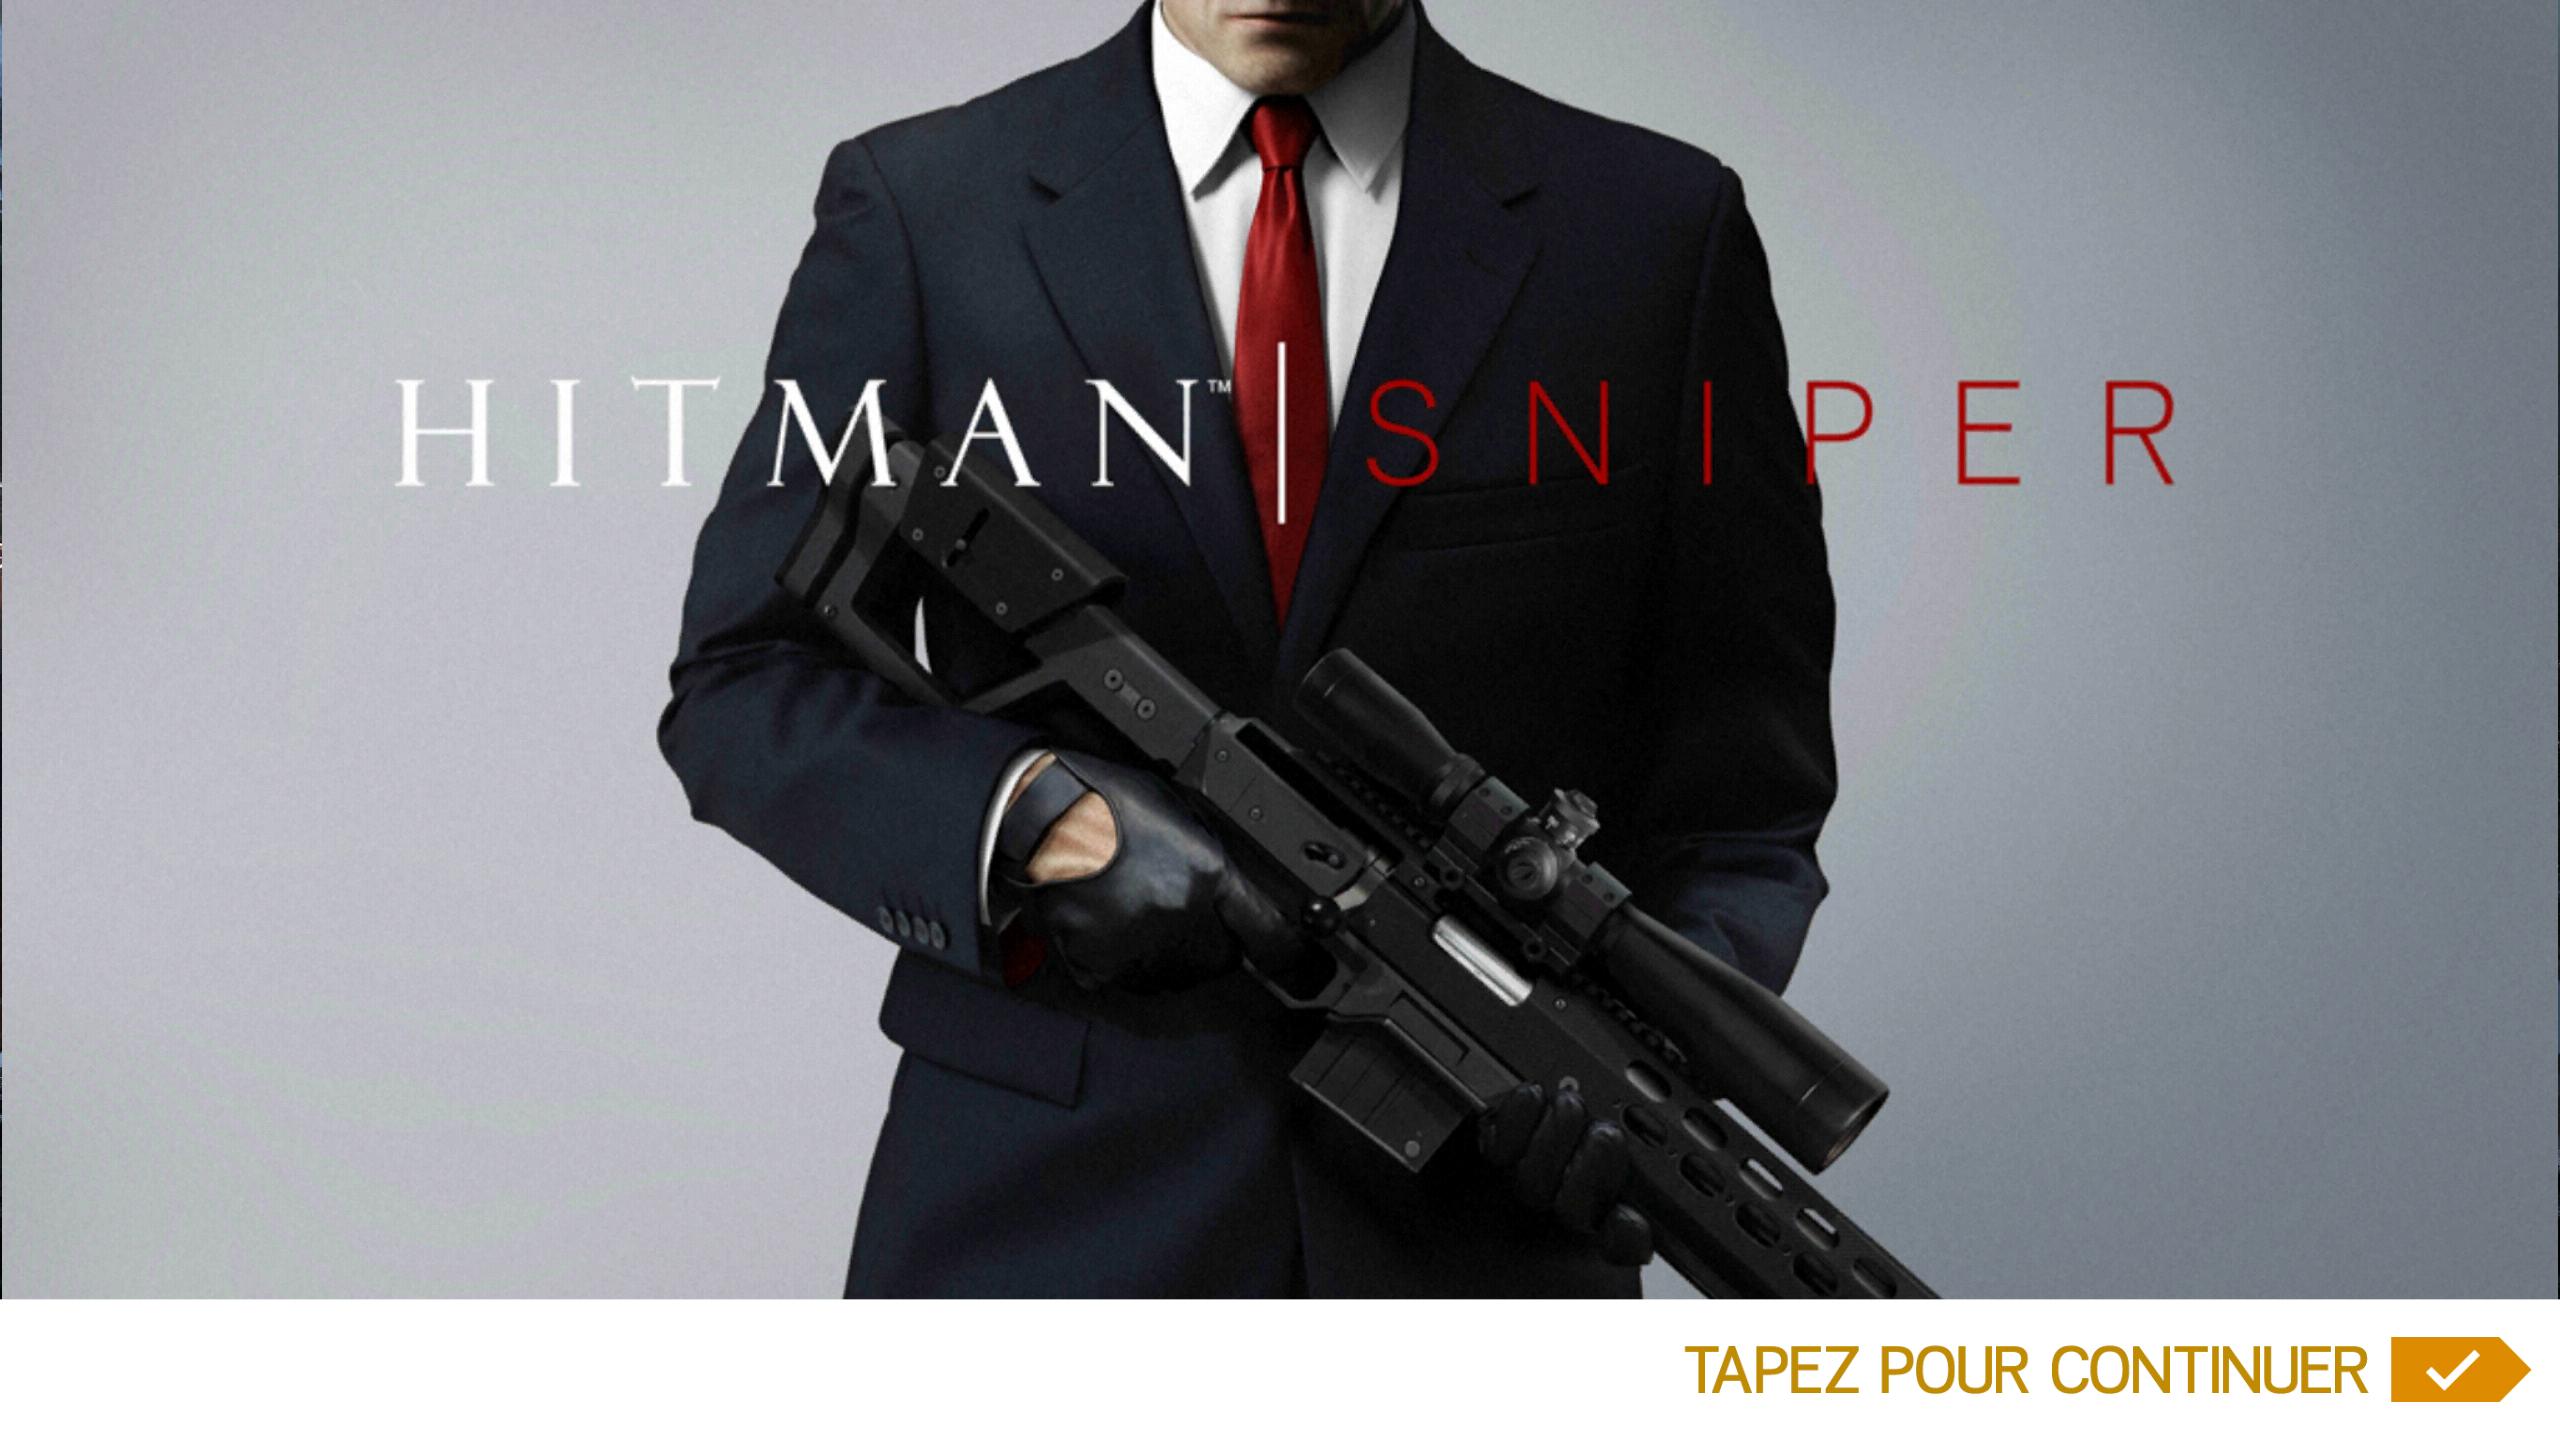 Hitman Sniper-1